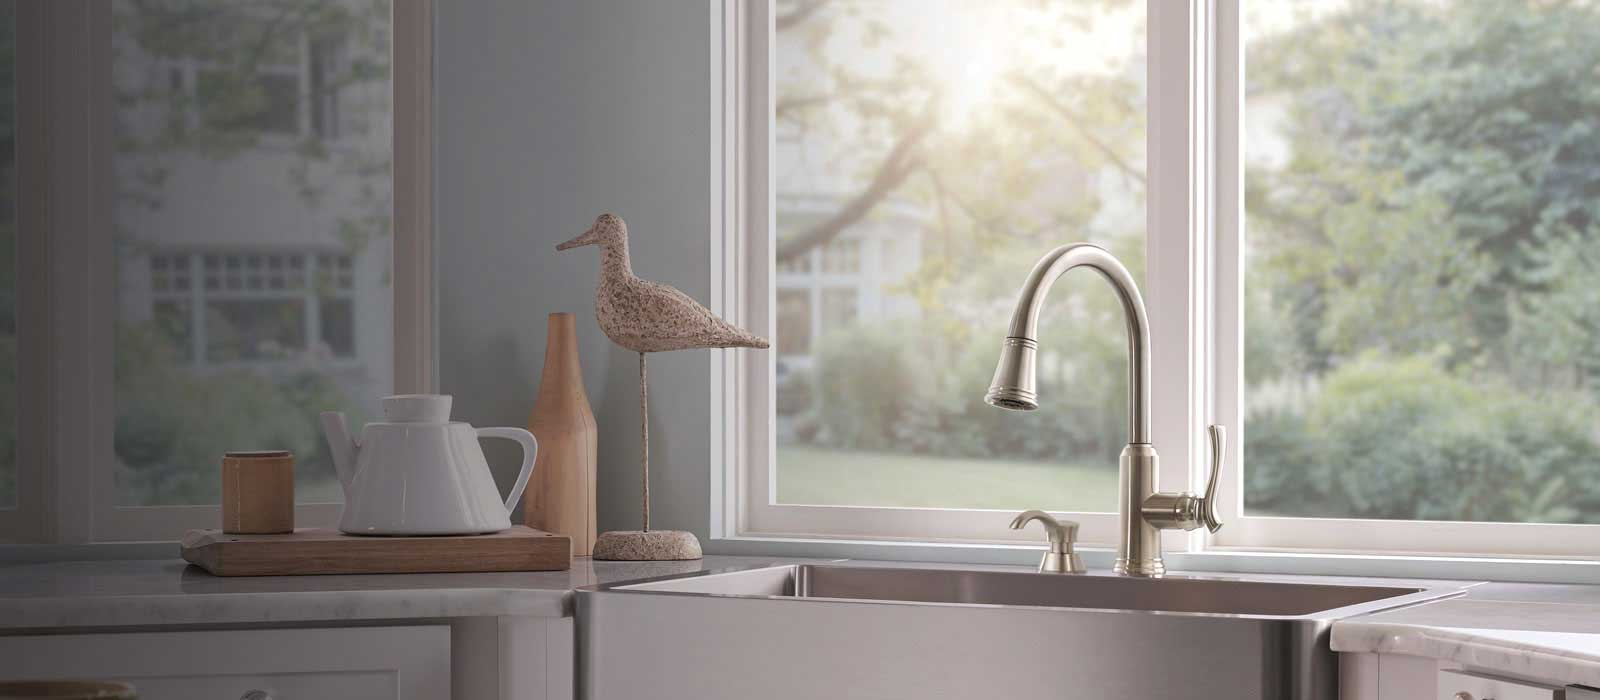 lakeview kitchen collection delta faucet